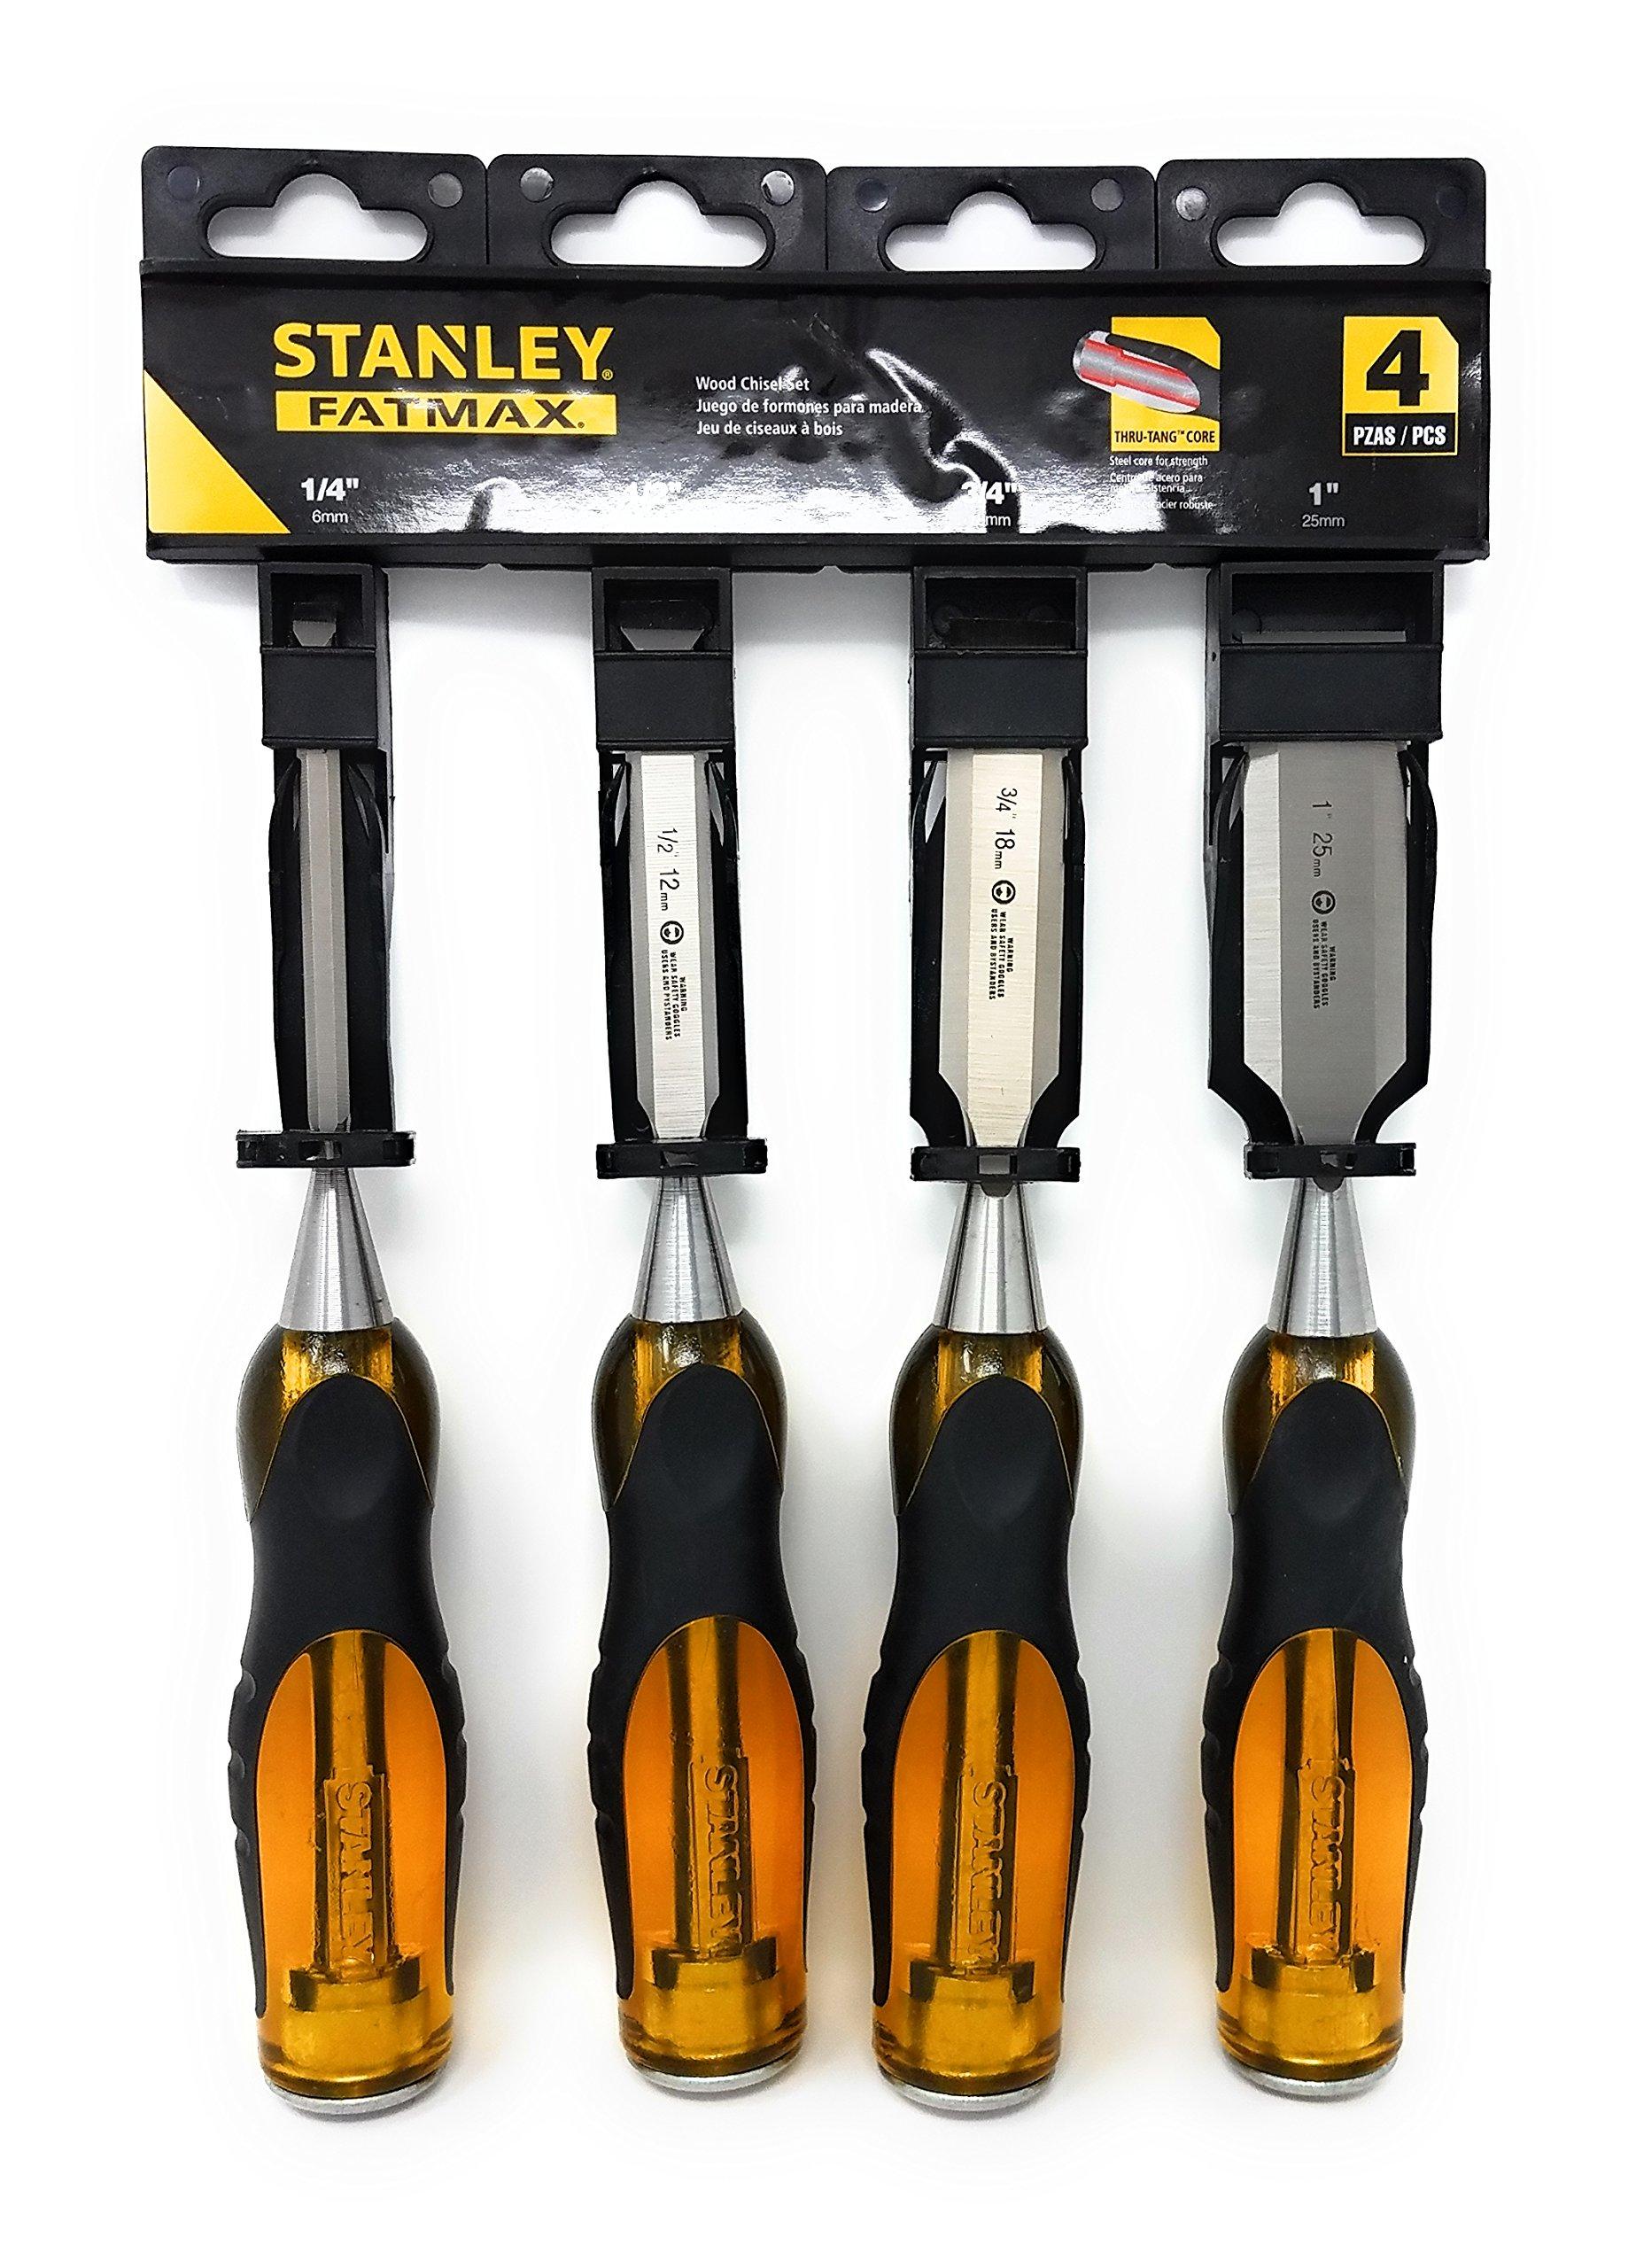 Stanley FATMAX 4 Piece Woodworking Chisels Set and Tesadorz Microfiber Towel Bundle by Stanley, Tesadorz